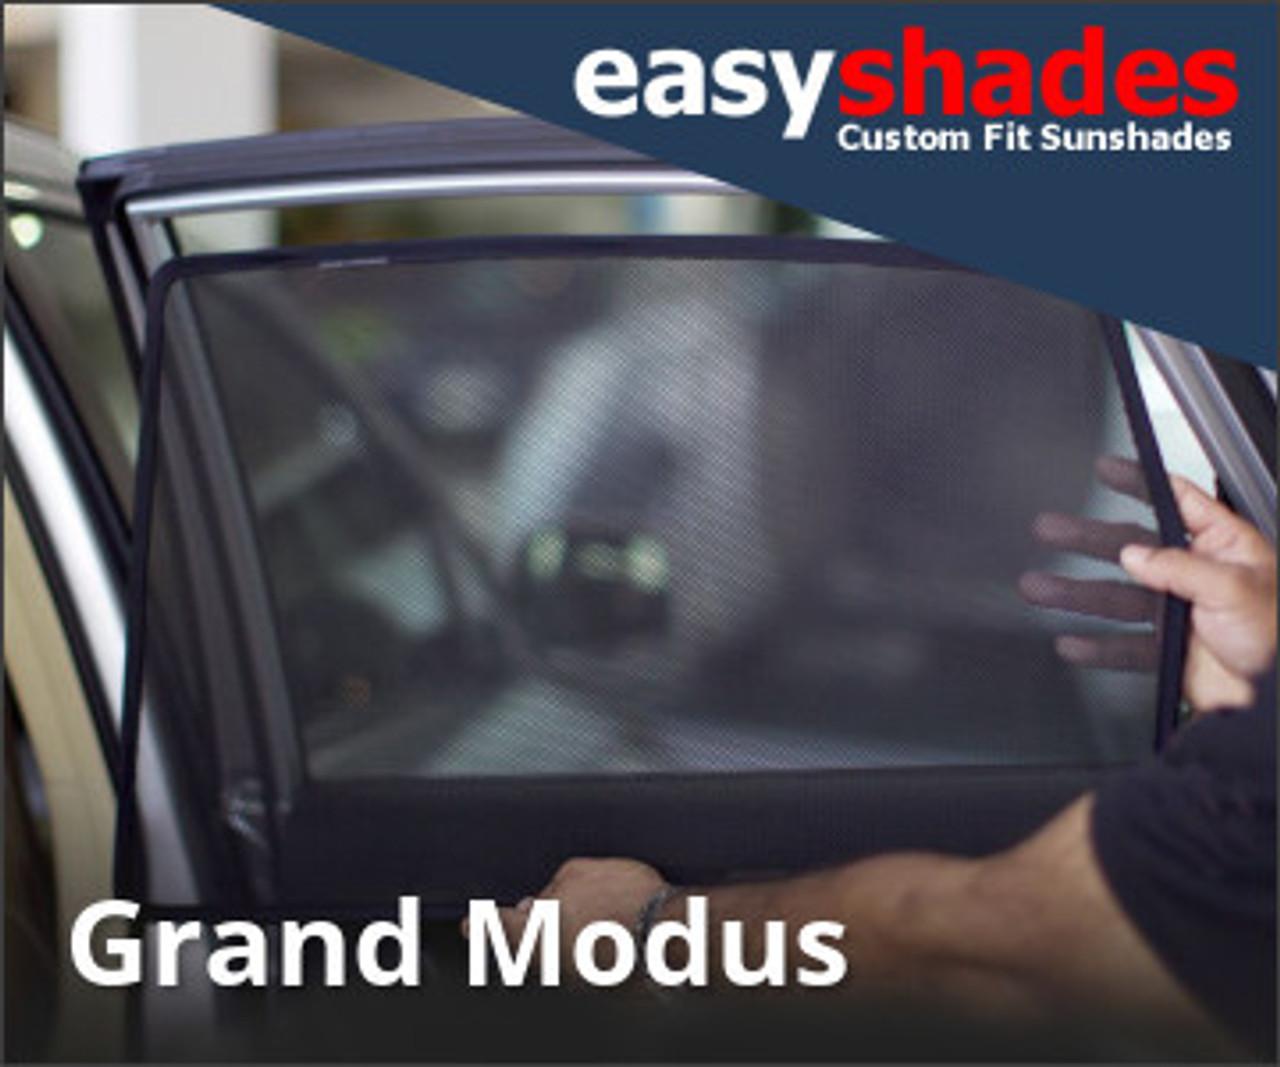 Grand Modus